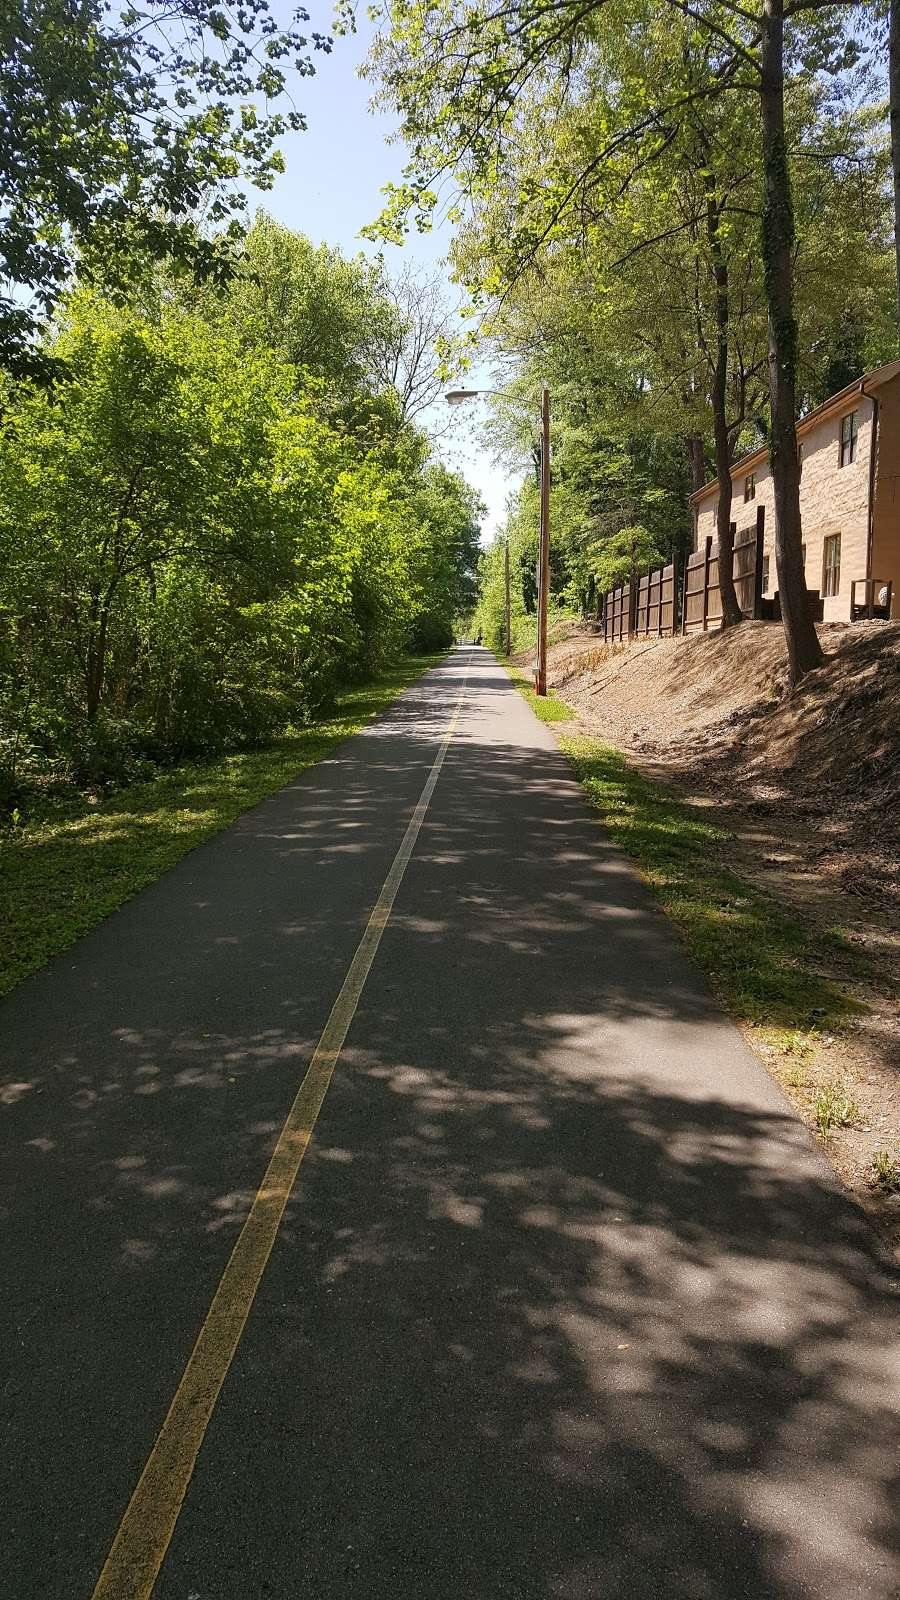 City Park - park  | Photo 1 of 10 | Address: 1000 N Aspen St, Lincolnton, NC 28092, USA | Phone: (704) 735-2671